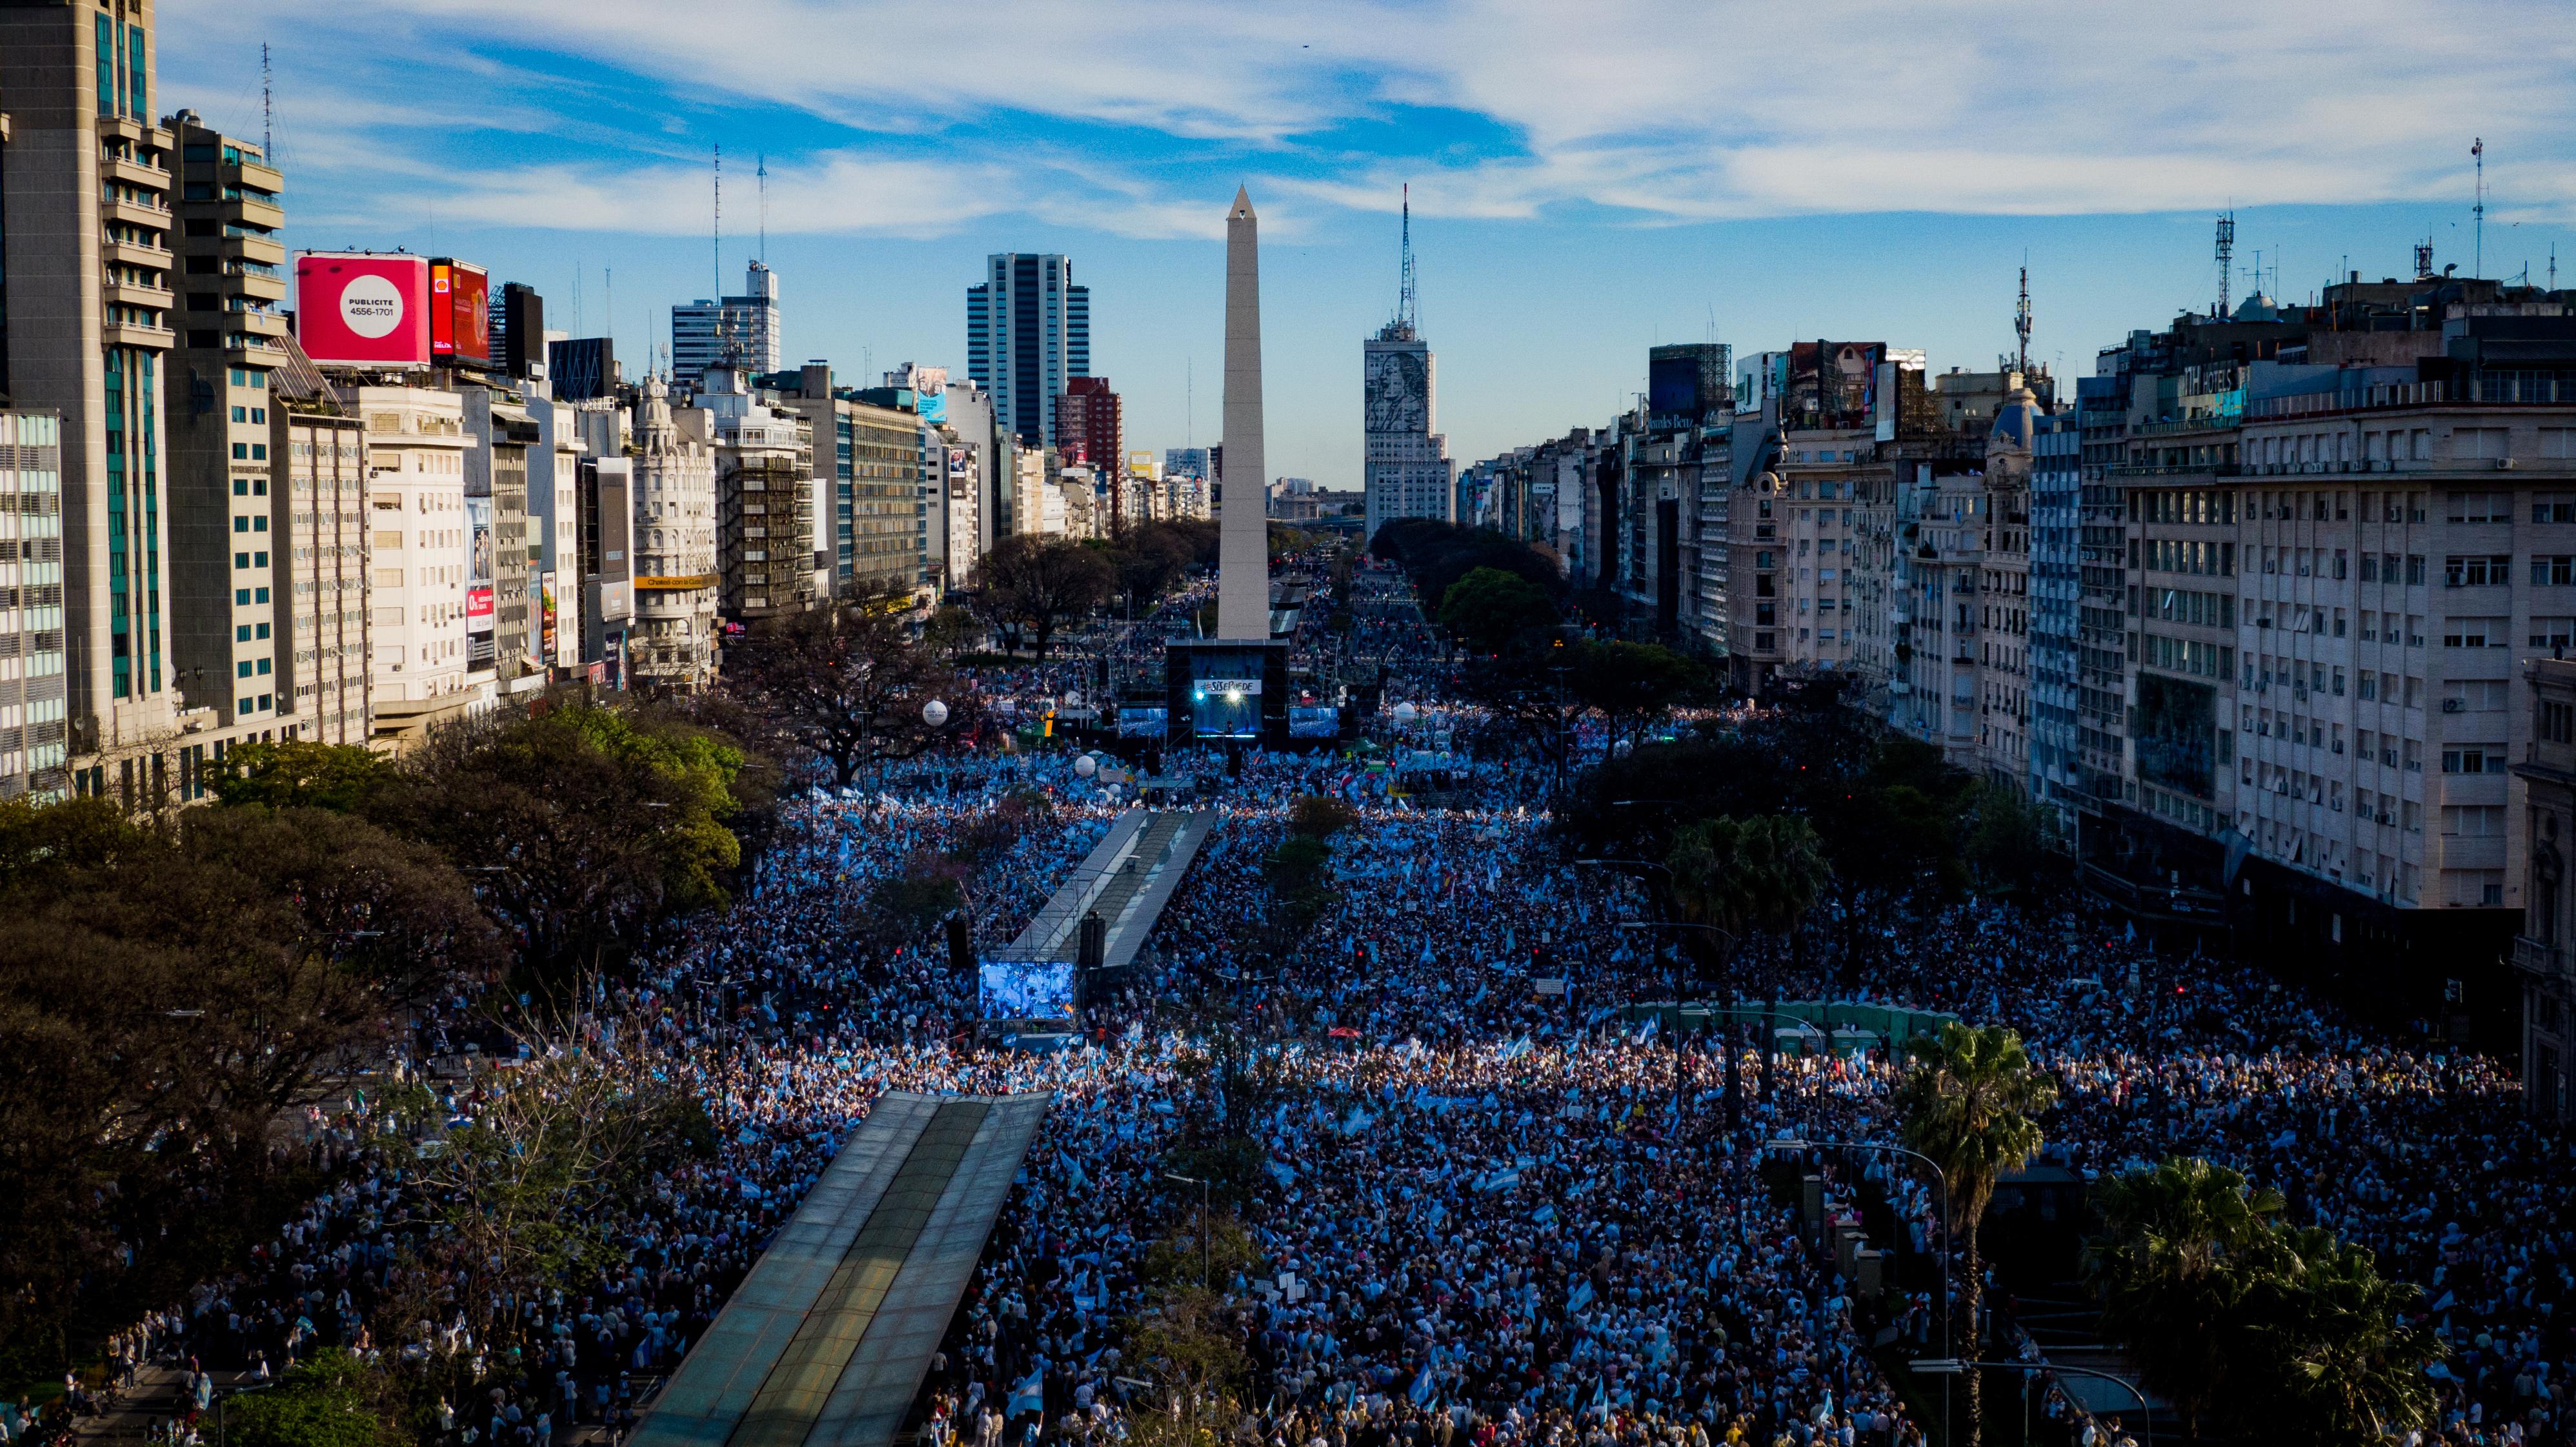 La multitud ocupó varias cuadras de la avenida 9 de Julio frente al Obelisco